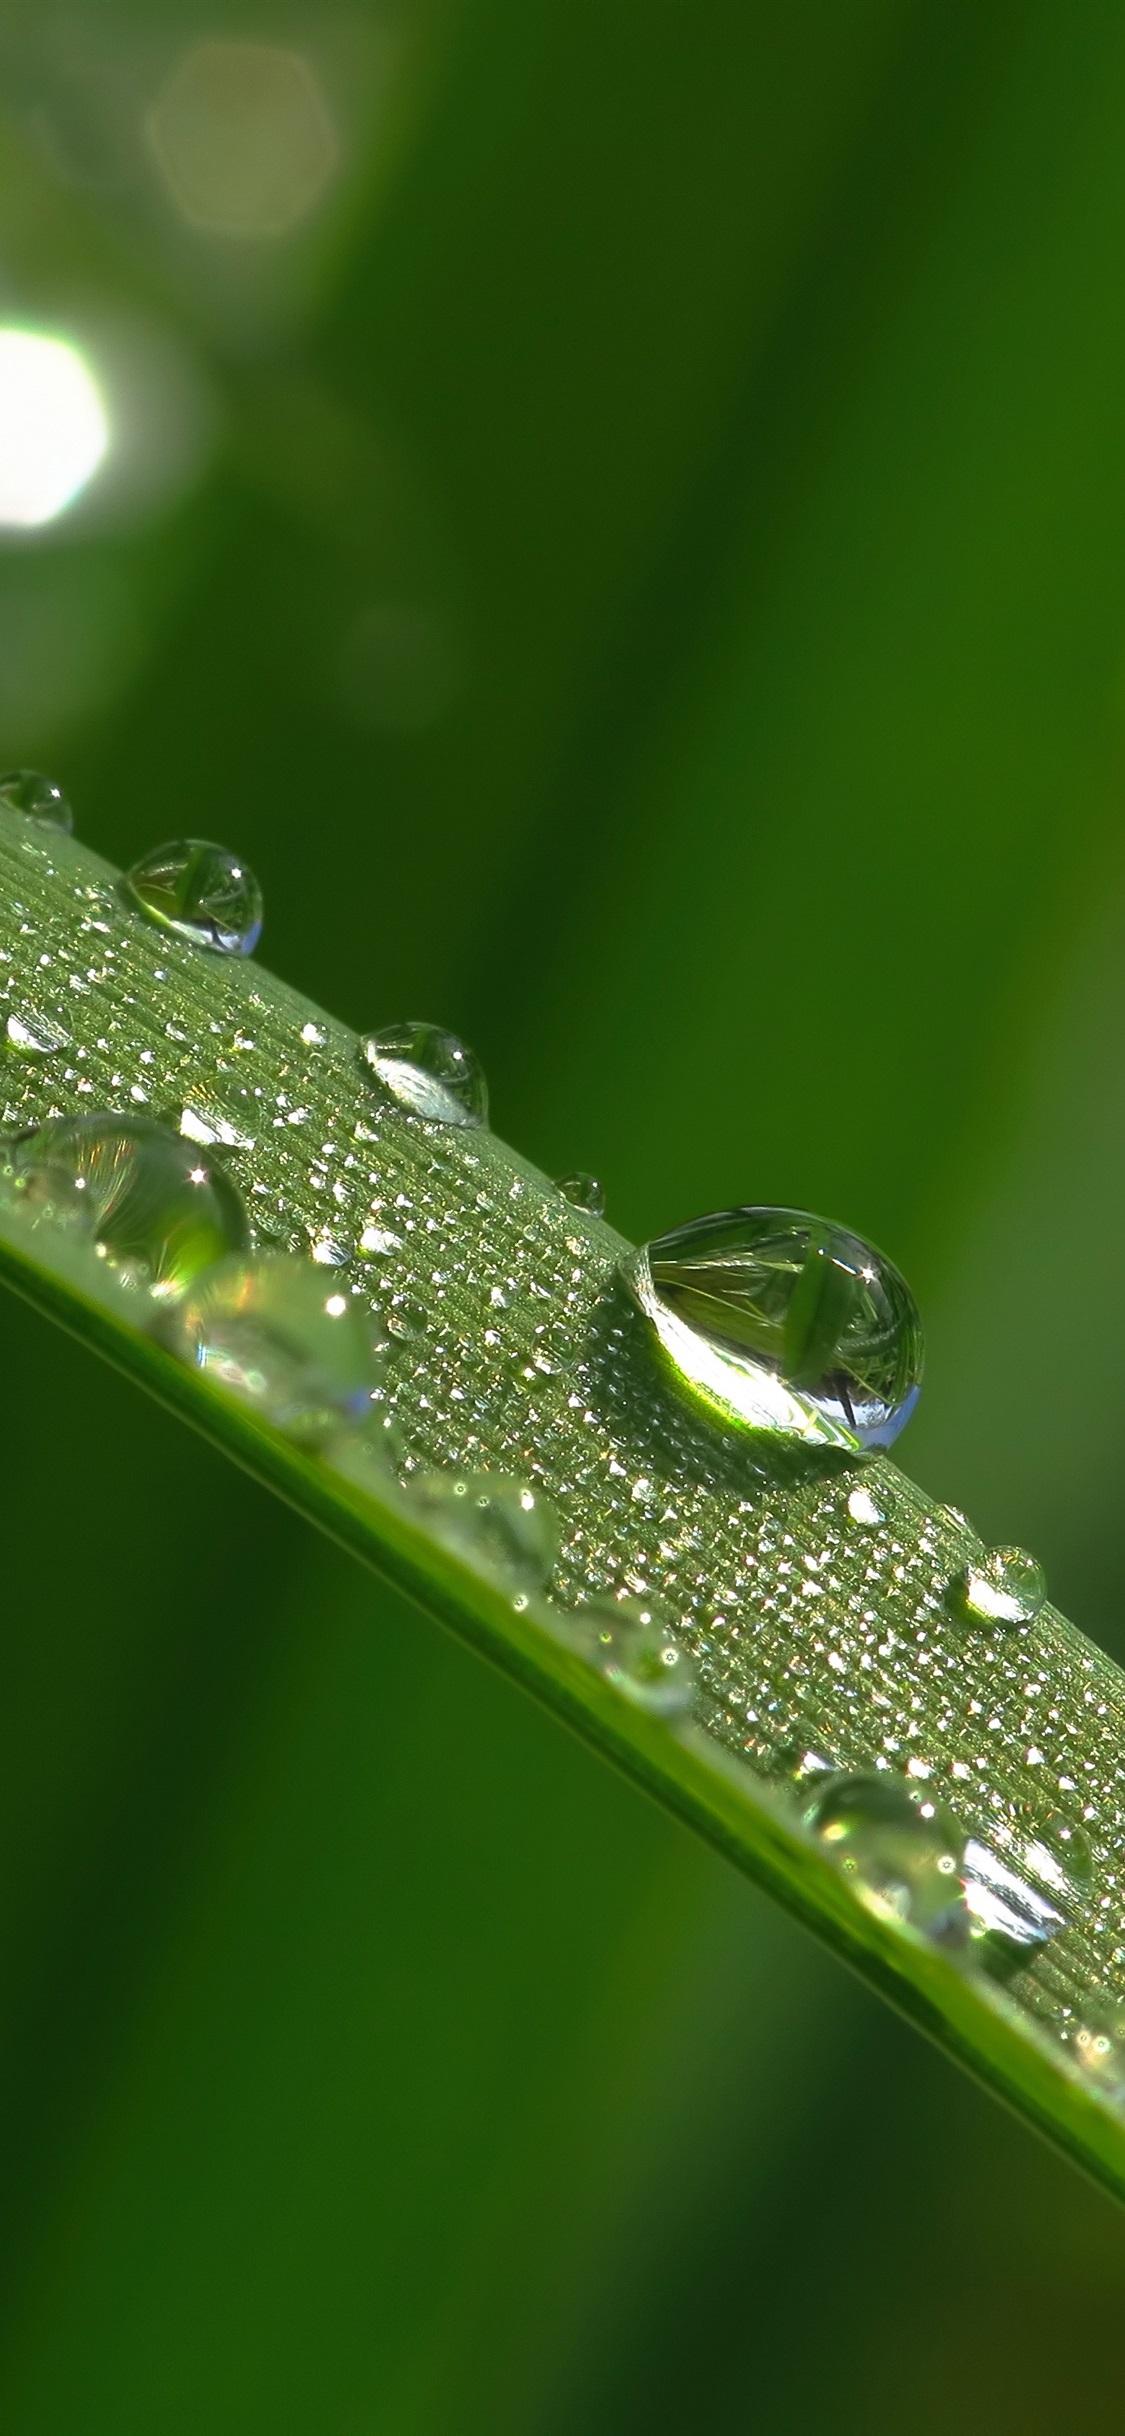 Grass Blade Leaf Water Droplets 1125x2436 Iphone Xs X